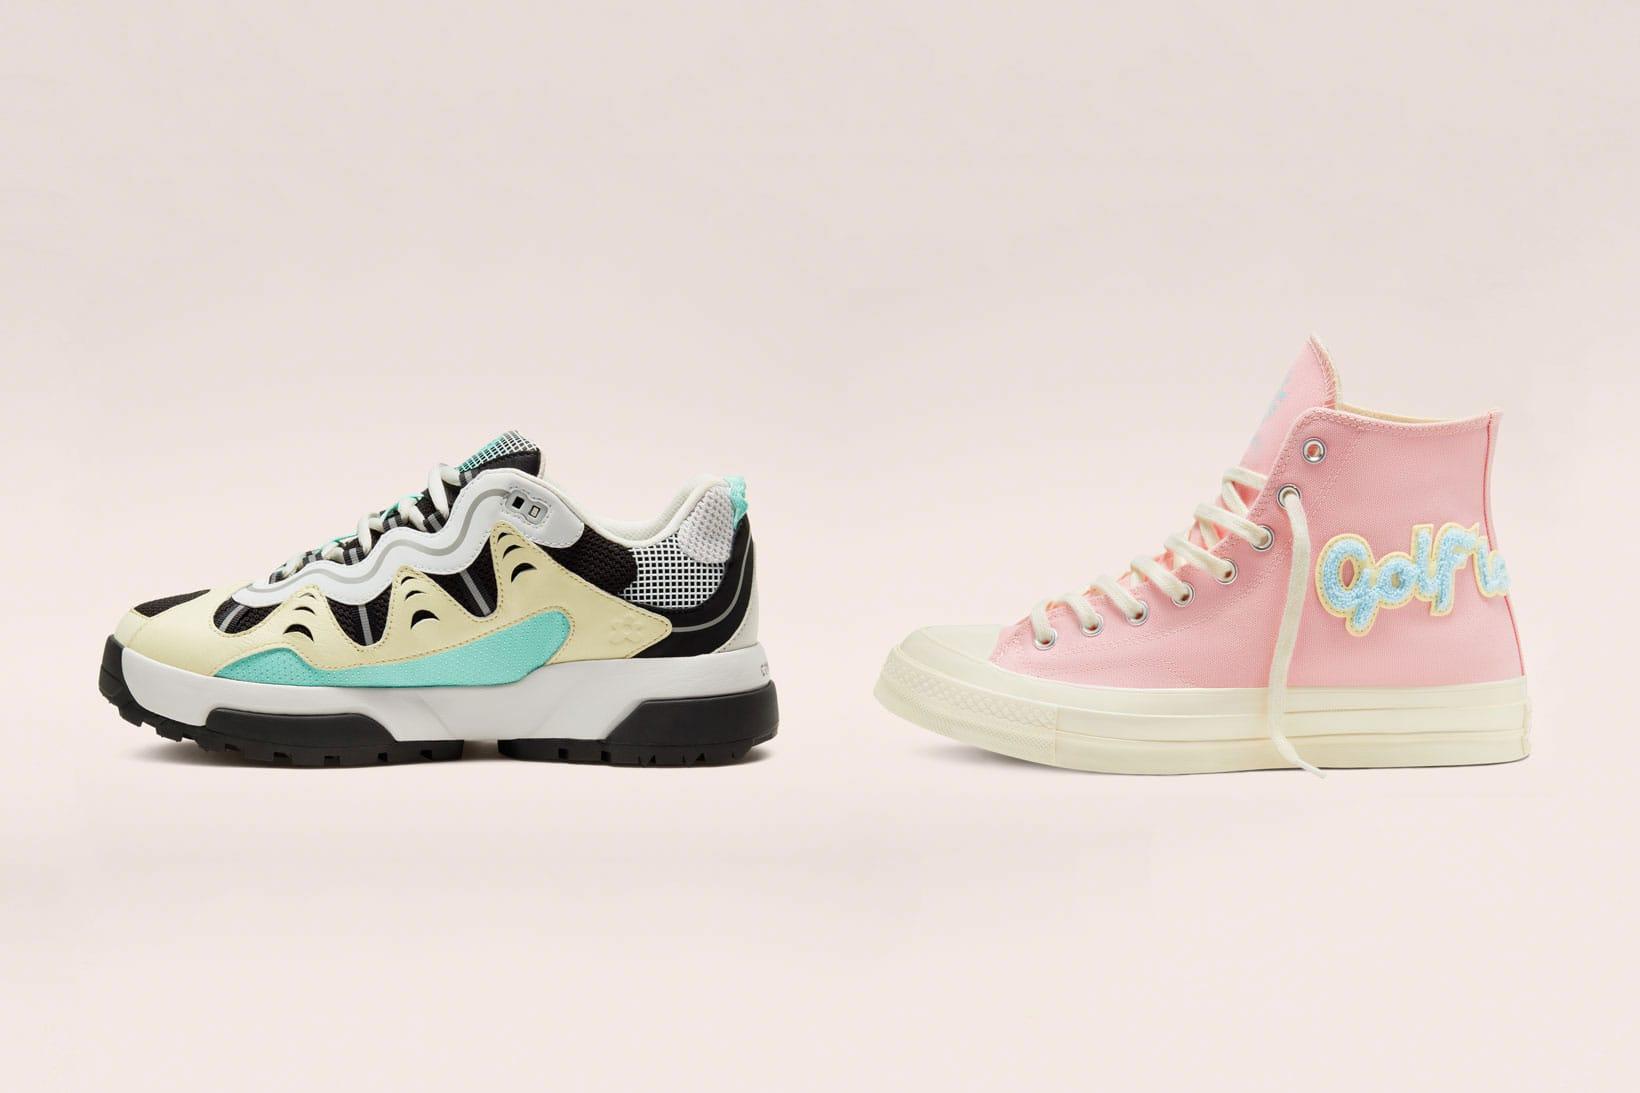 Buy GOLF le FLEUR* x Converse in Pink